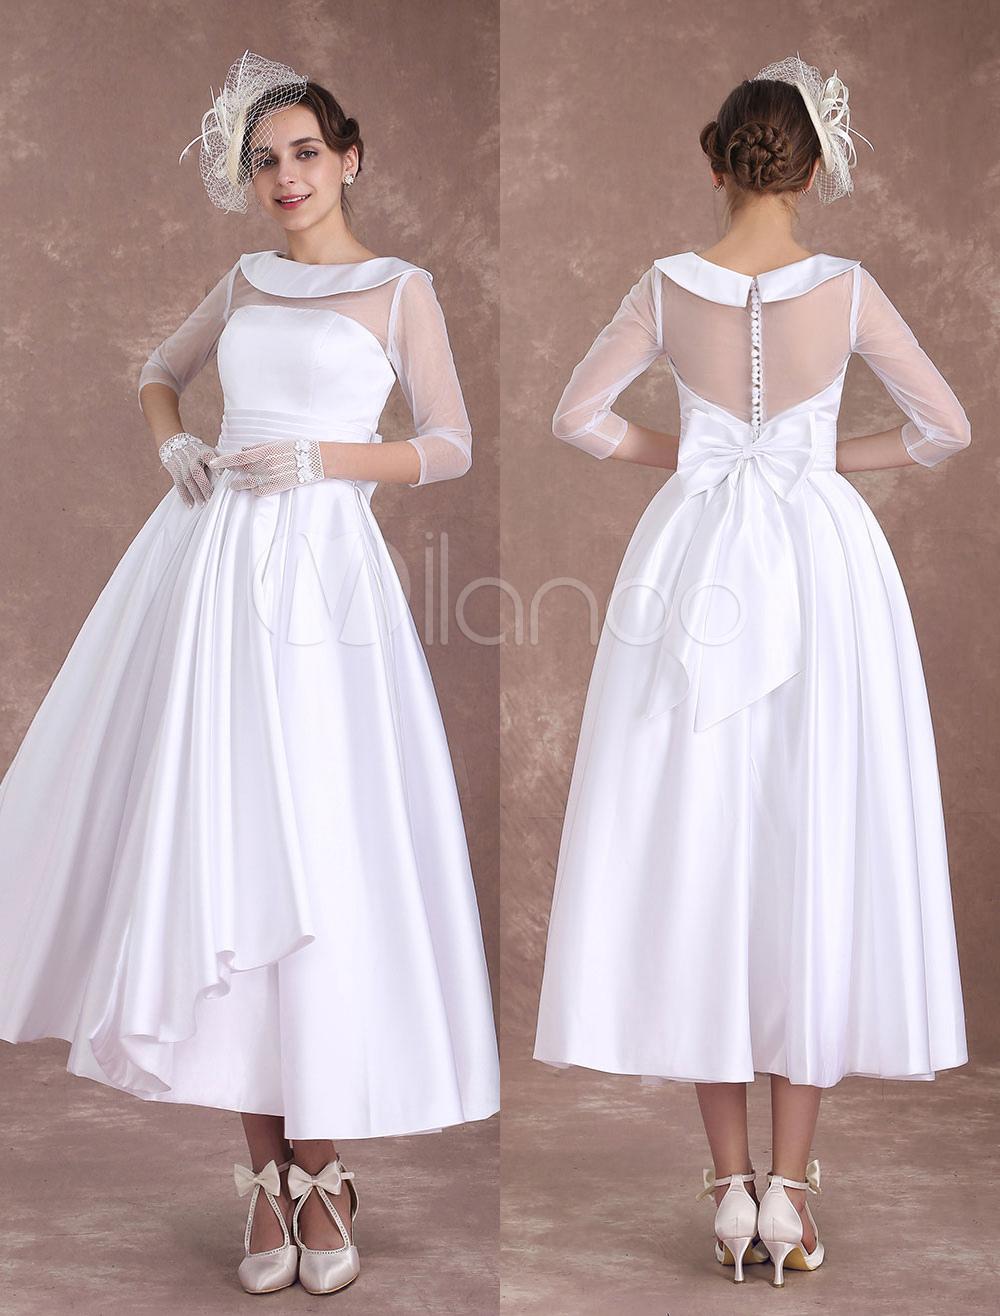 White Wedding Dresses Short 1950's Vintage Bridal Dress Satin Long Sleeve Pleated Illusion Tea Length Wedding Reception Dress Milanoo photo